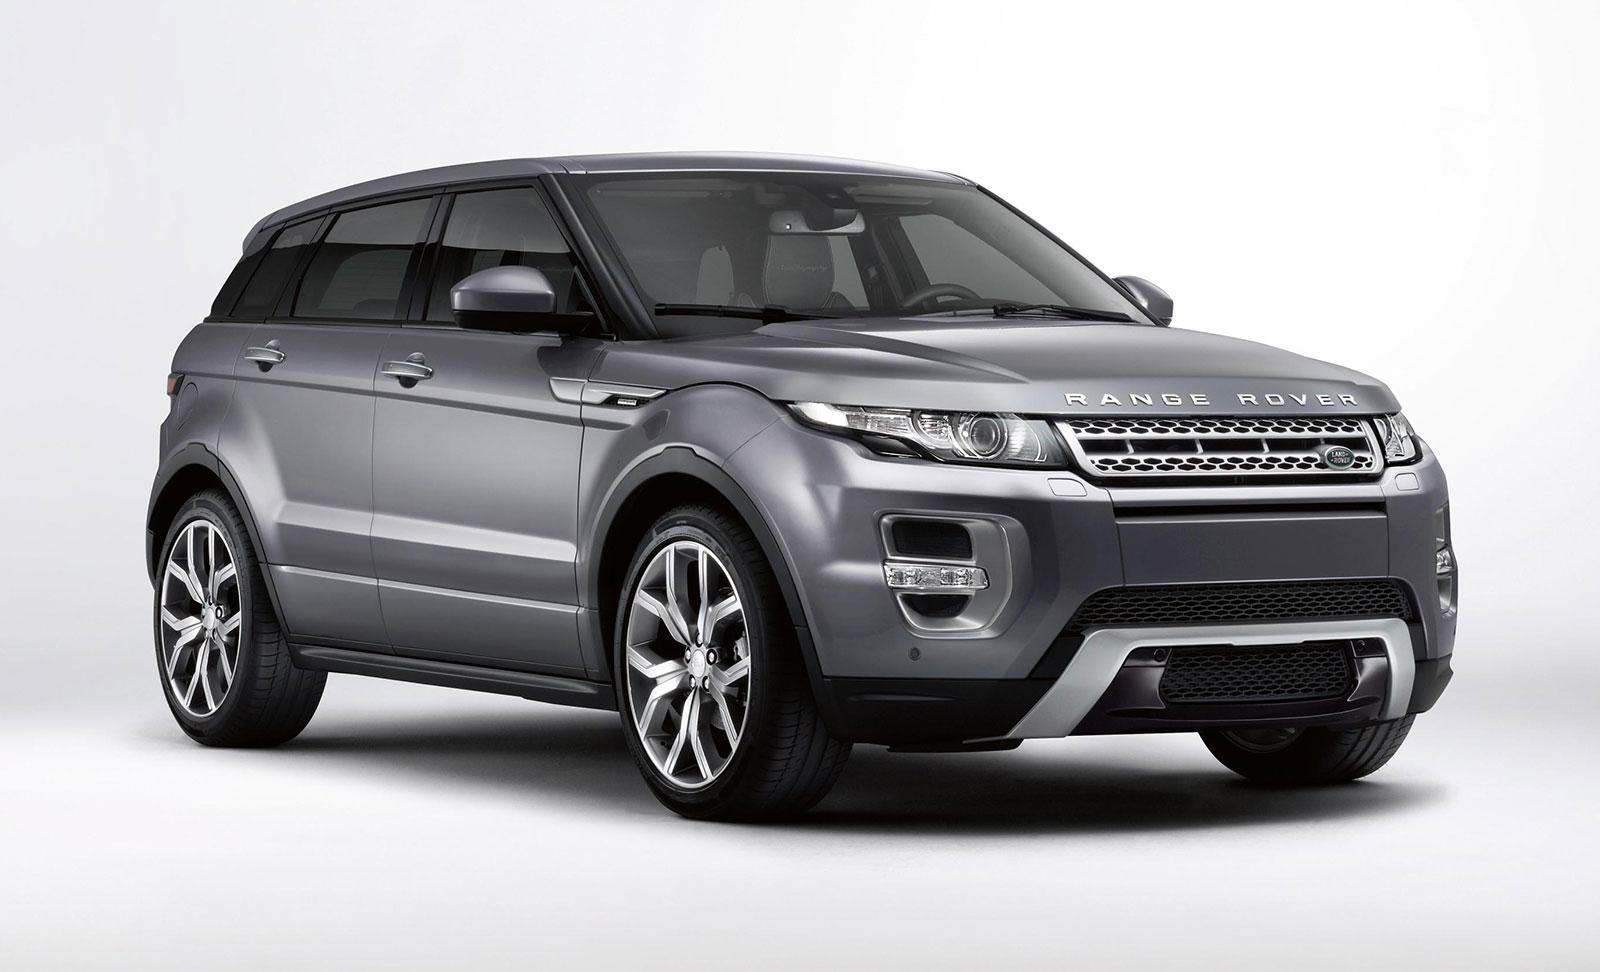 range rover evoque 2.0 litre